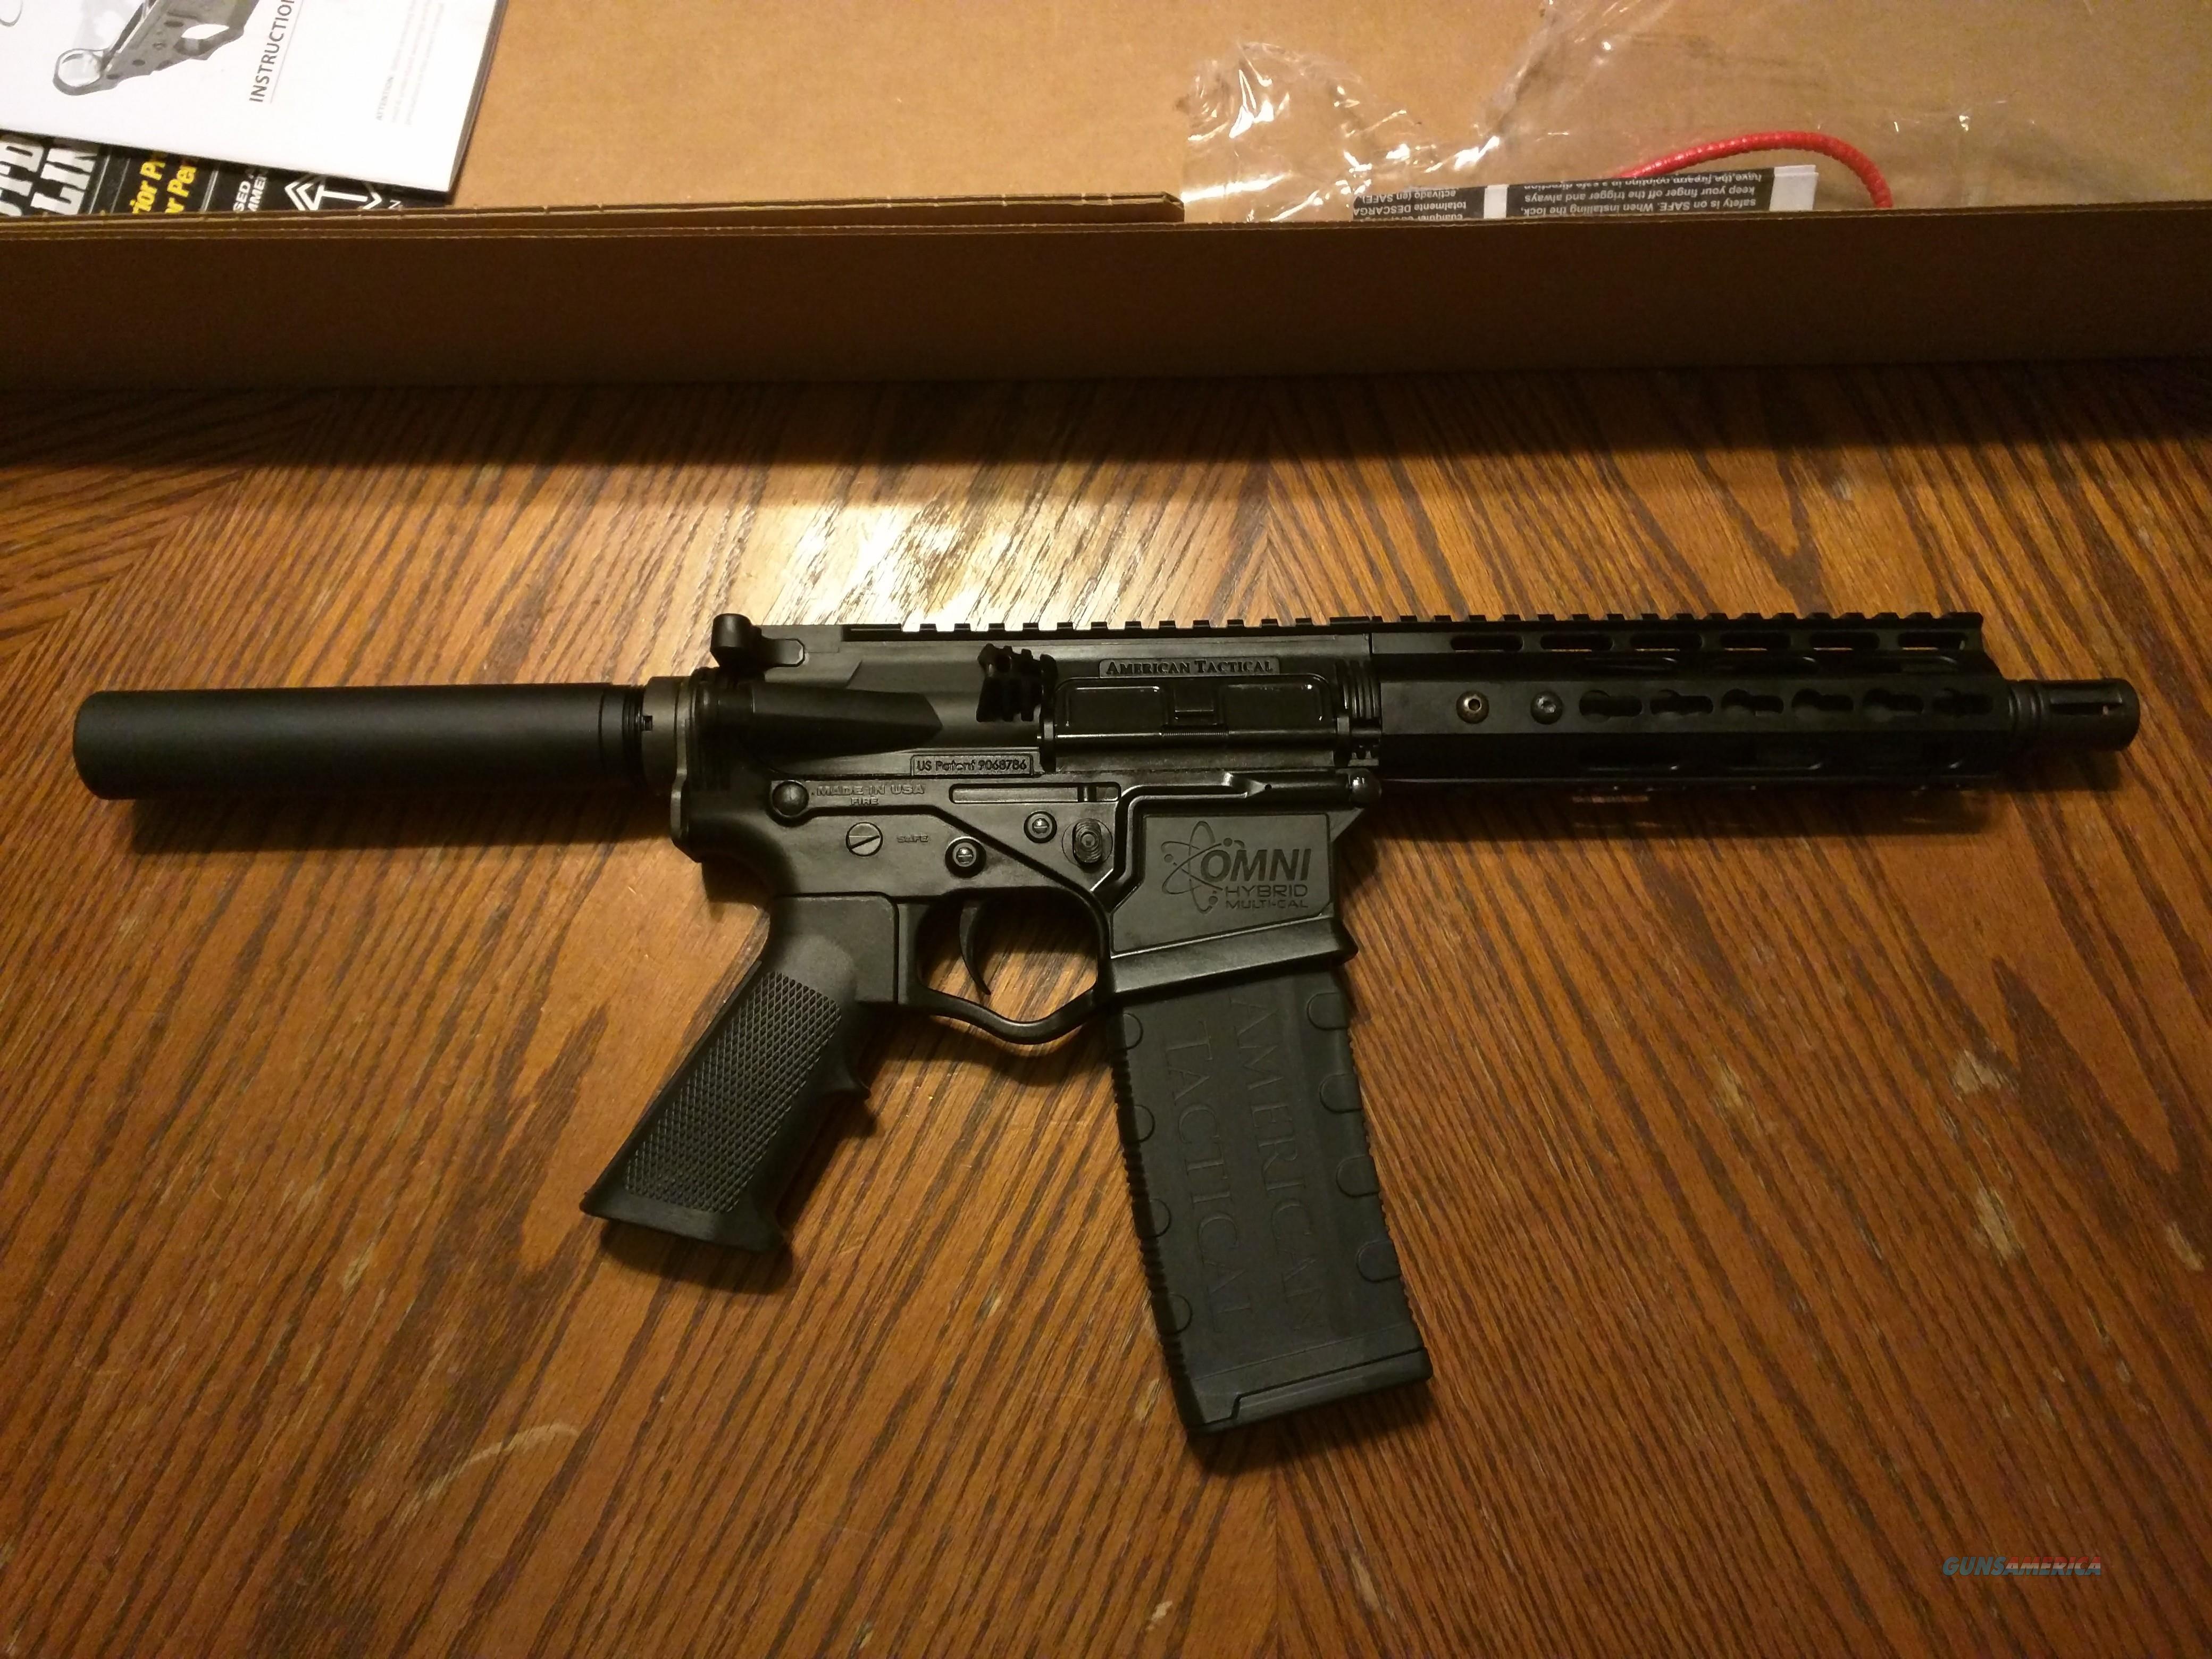 "ATI AR 15 AR15 Pistol American Tactical Omni Maxx Hybrid 300 AAC BLACKOUT 8.5"" Nitride Barrel, Aluminum Key Mod Hand Guard (1) 30 Rd Mag NIB Lightweight Corrosion Resistant FREE LAYAWAY!!  Guns > Rifles > AR-15 Rifles - Small Manufacturers > Complete Rifle"